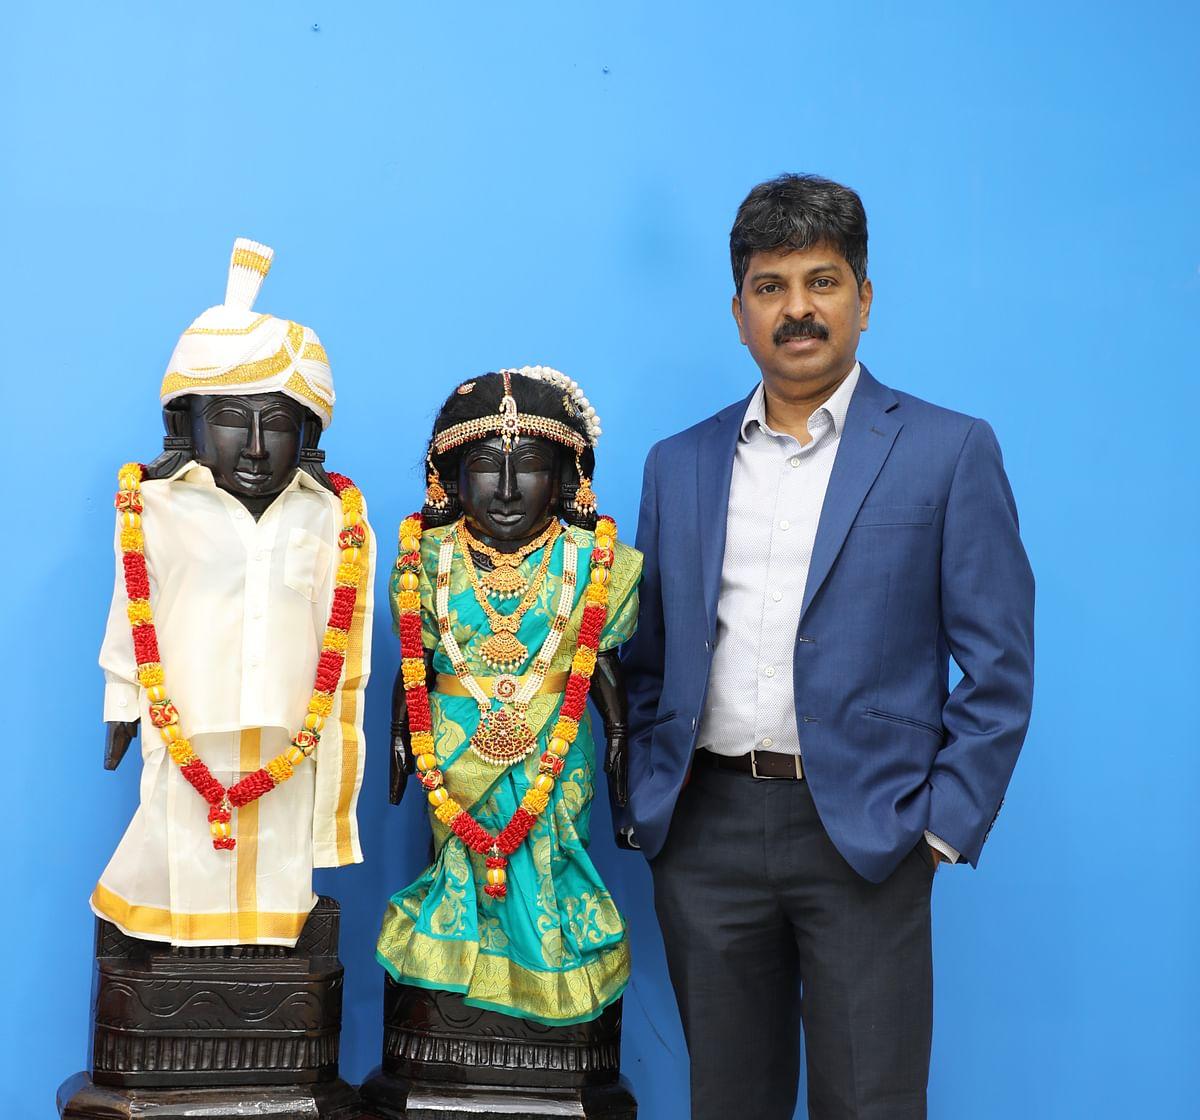 I will take any outcome in a positive way, says Matrimony.com's Murugavel Janakiraman to BrandSutra